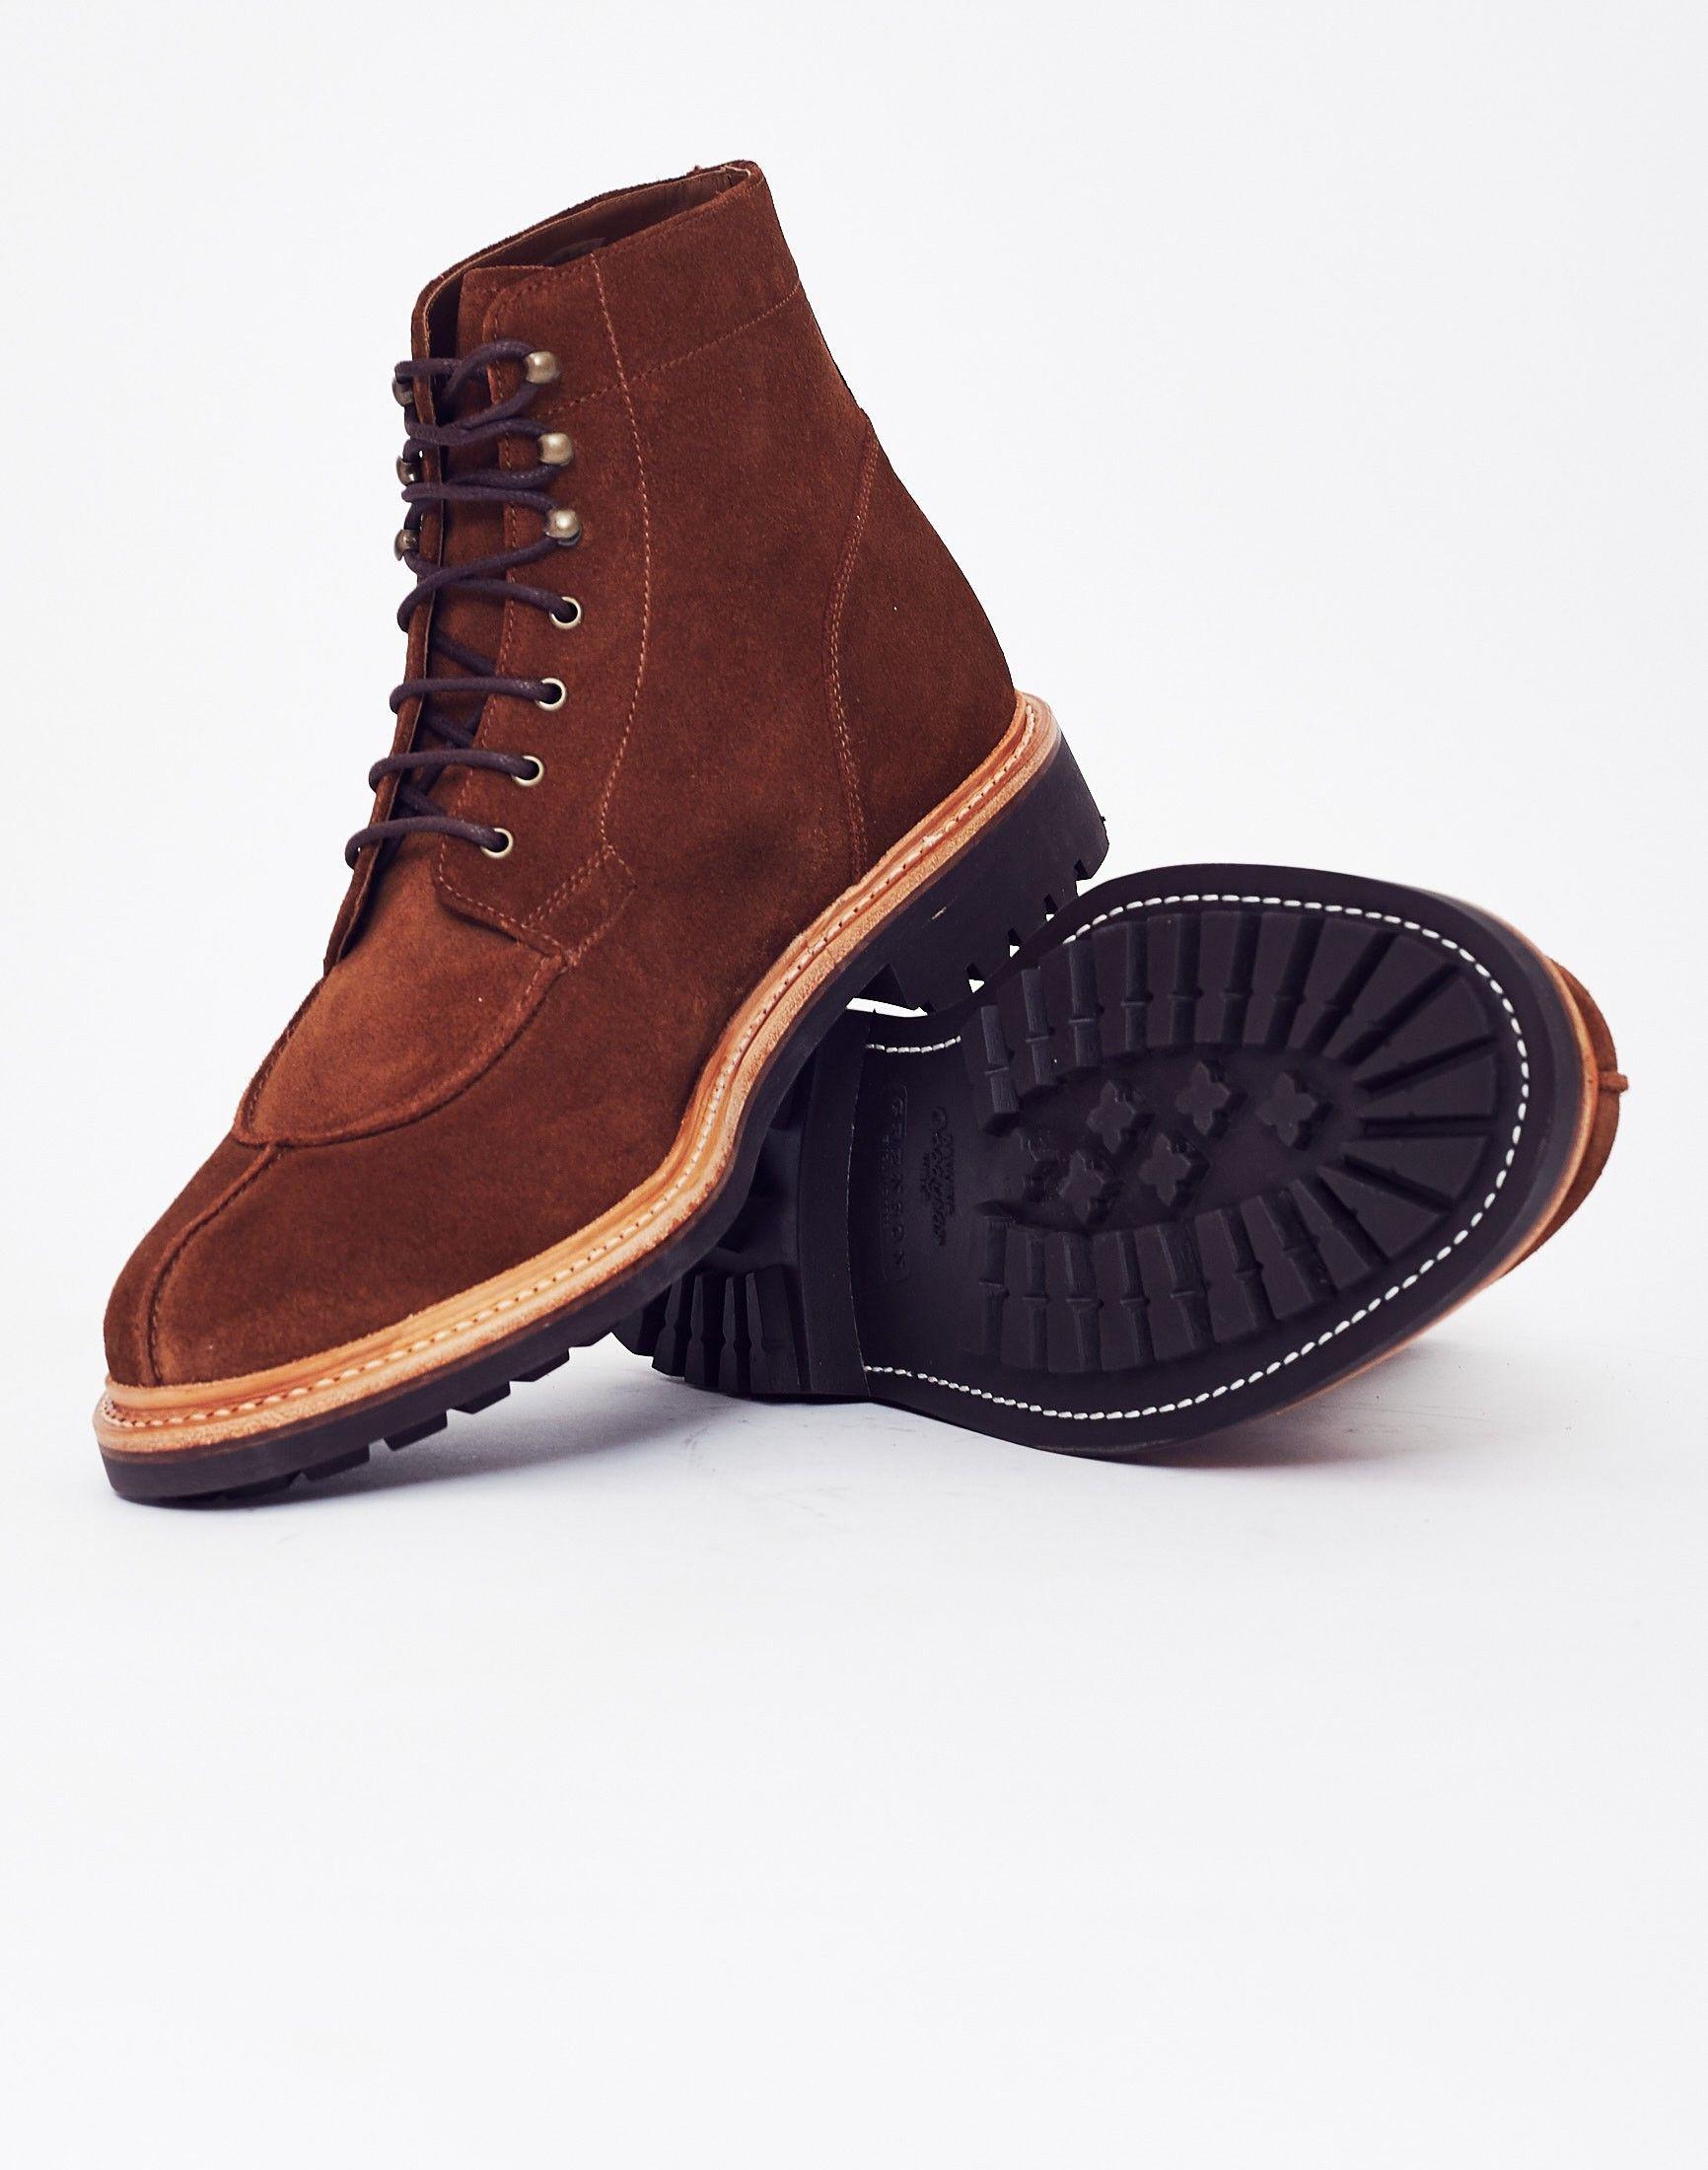 72dfc768b71 Grenson Grover Suede Boot Brown Botas Zapatos